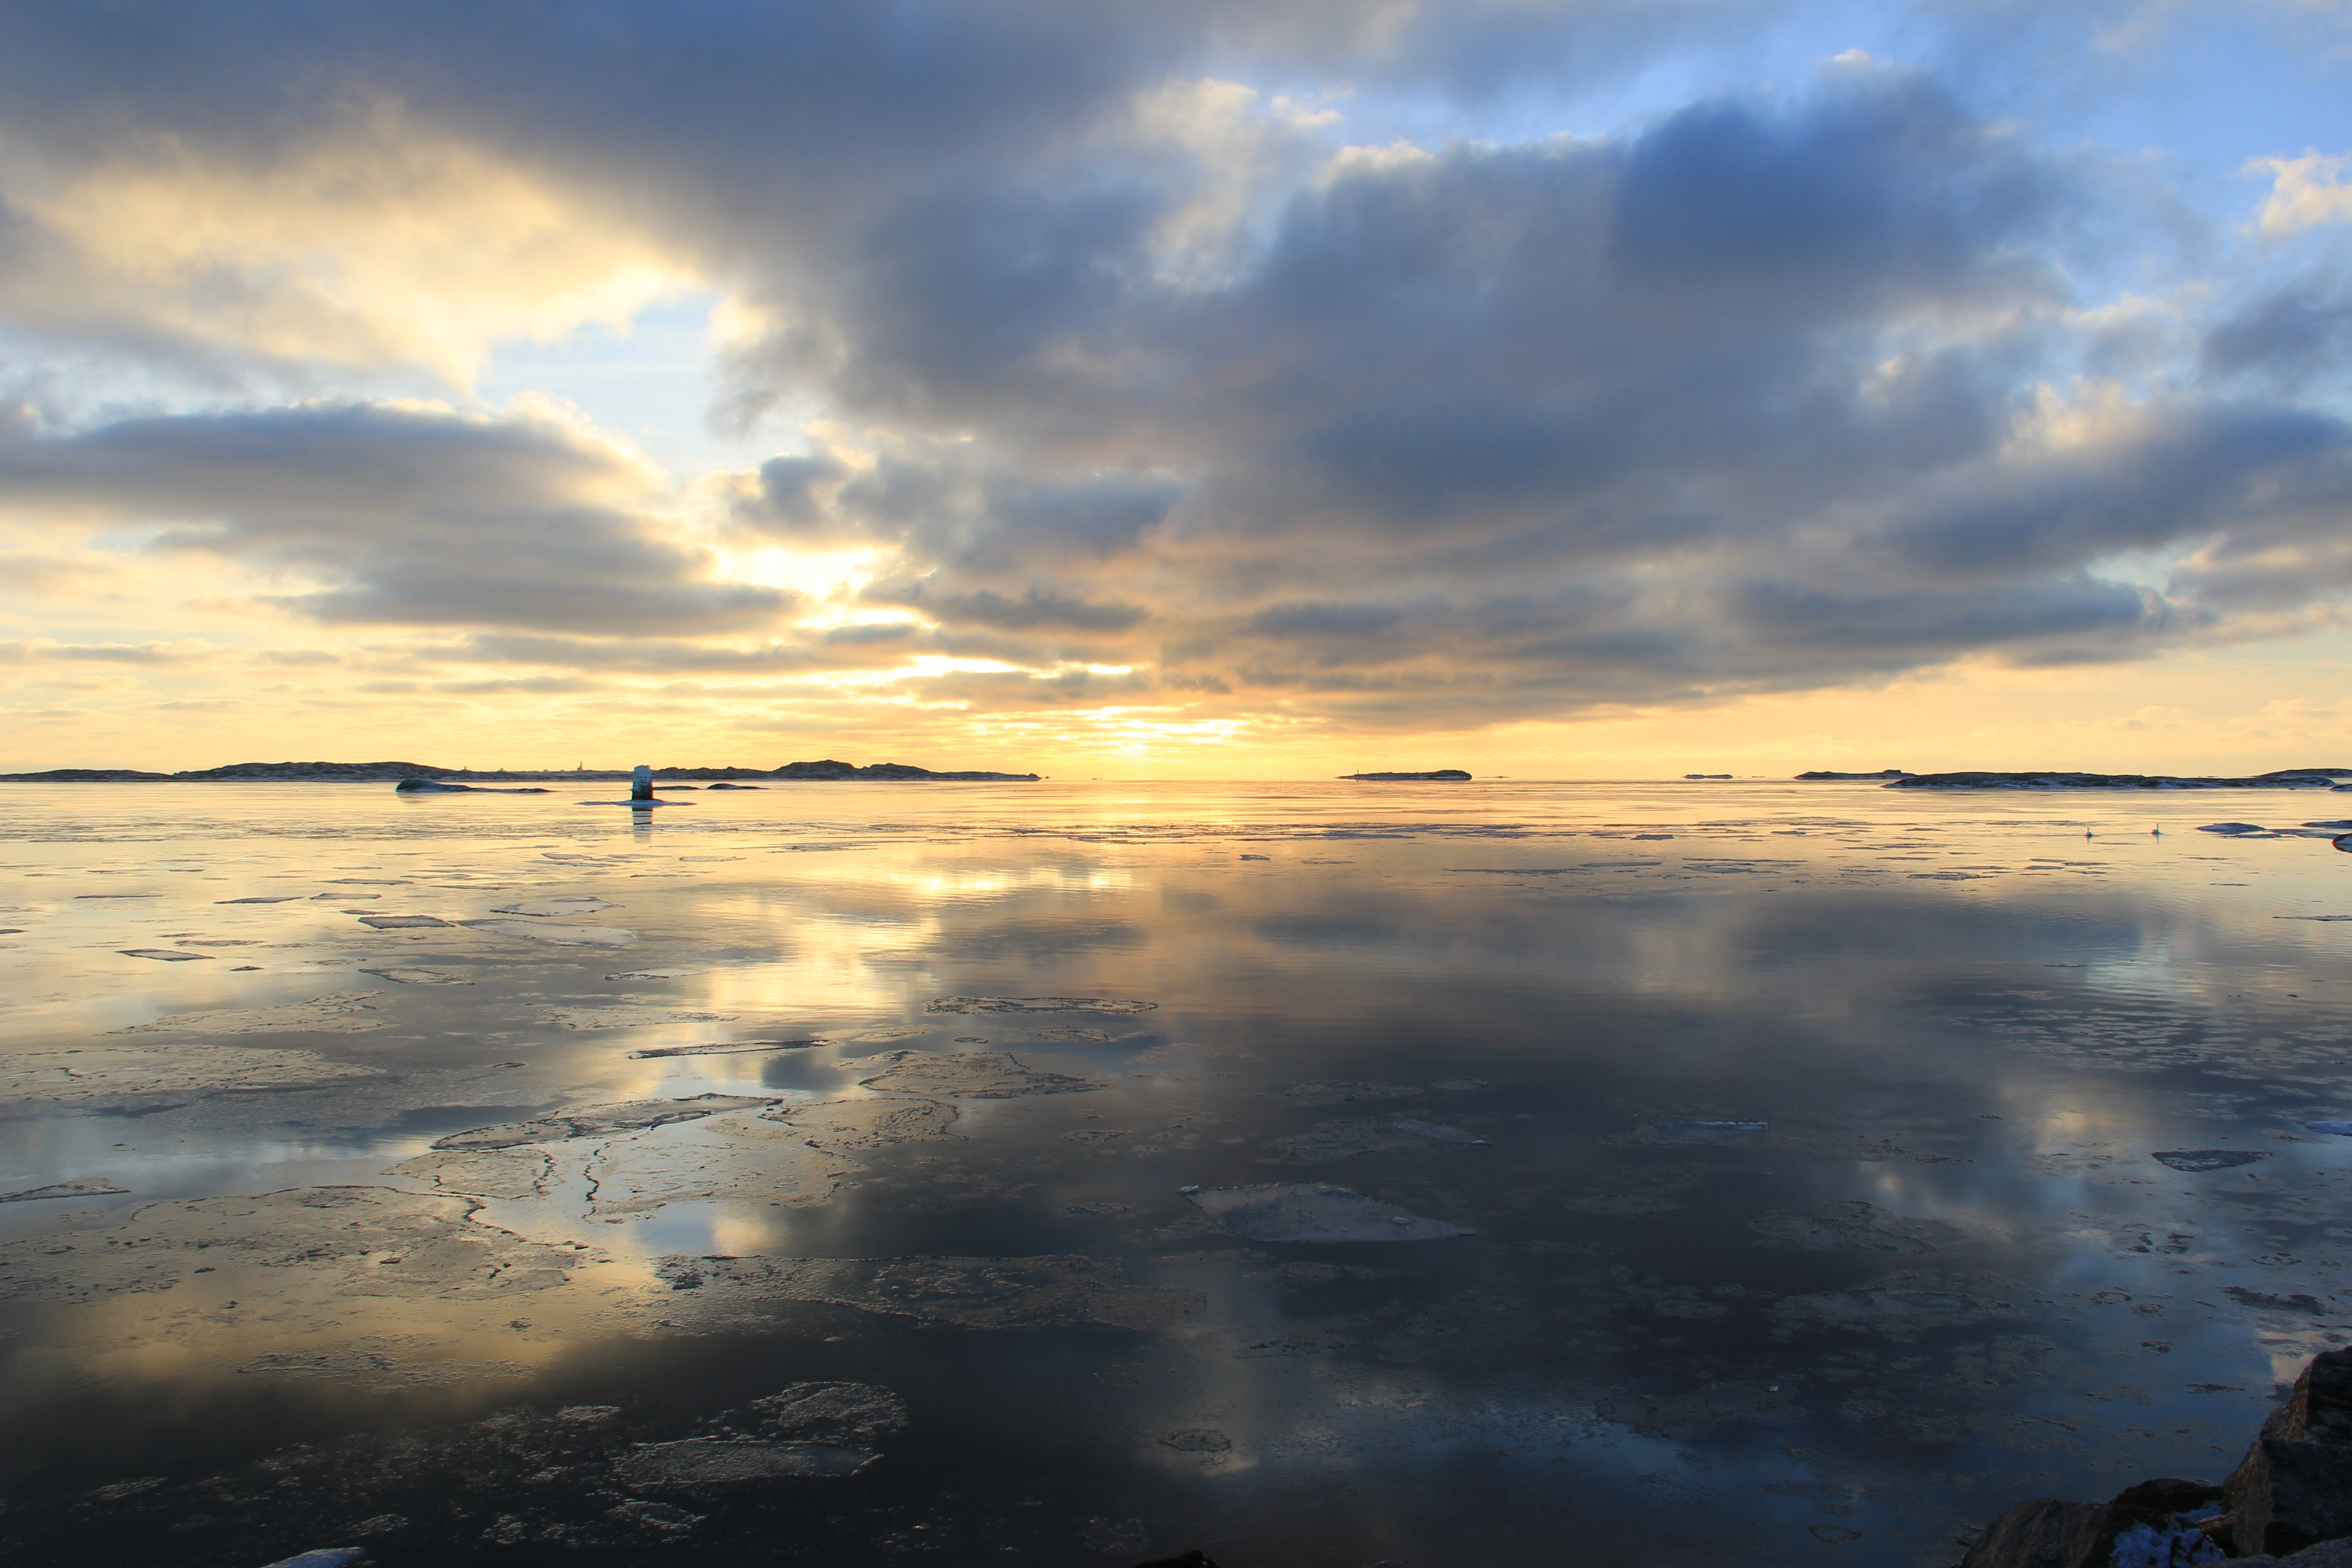 Vinter_Vinga_fyr_www.elsapahalso.se